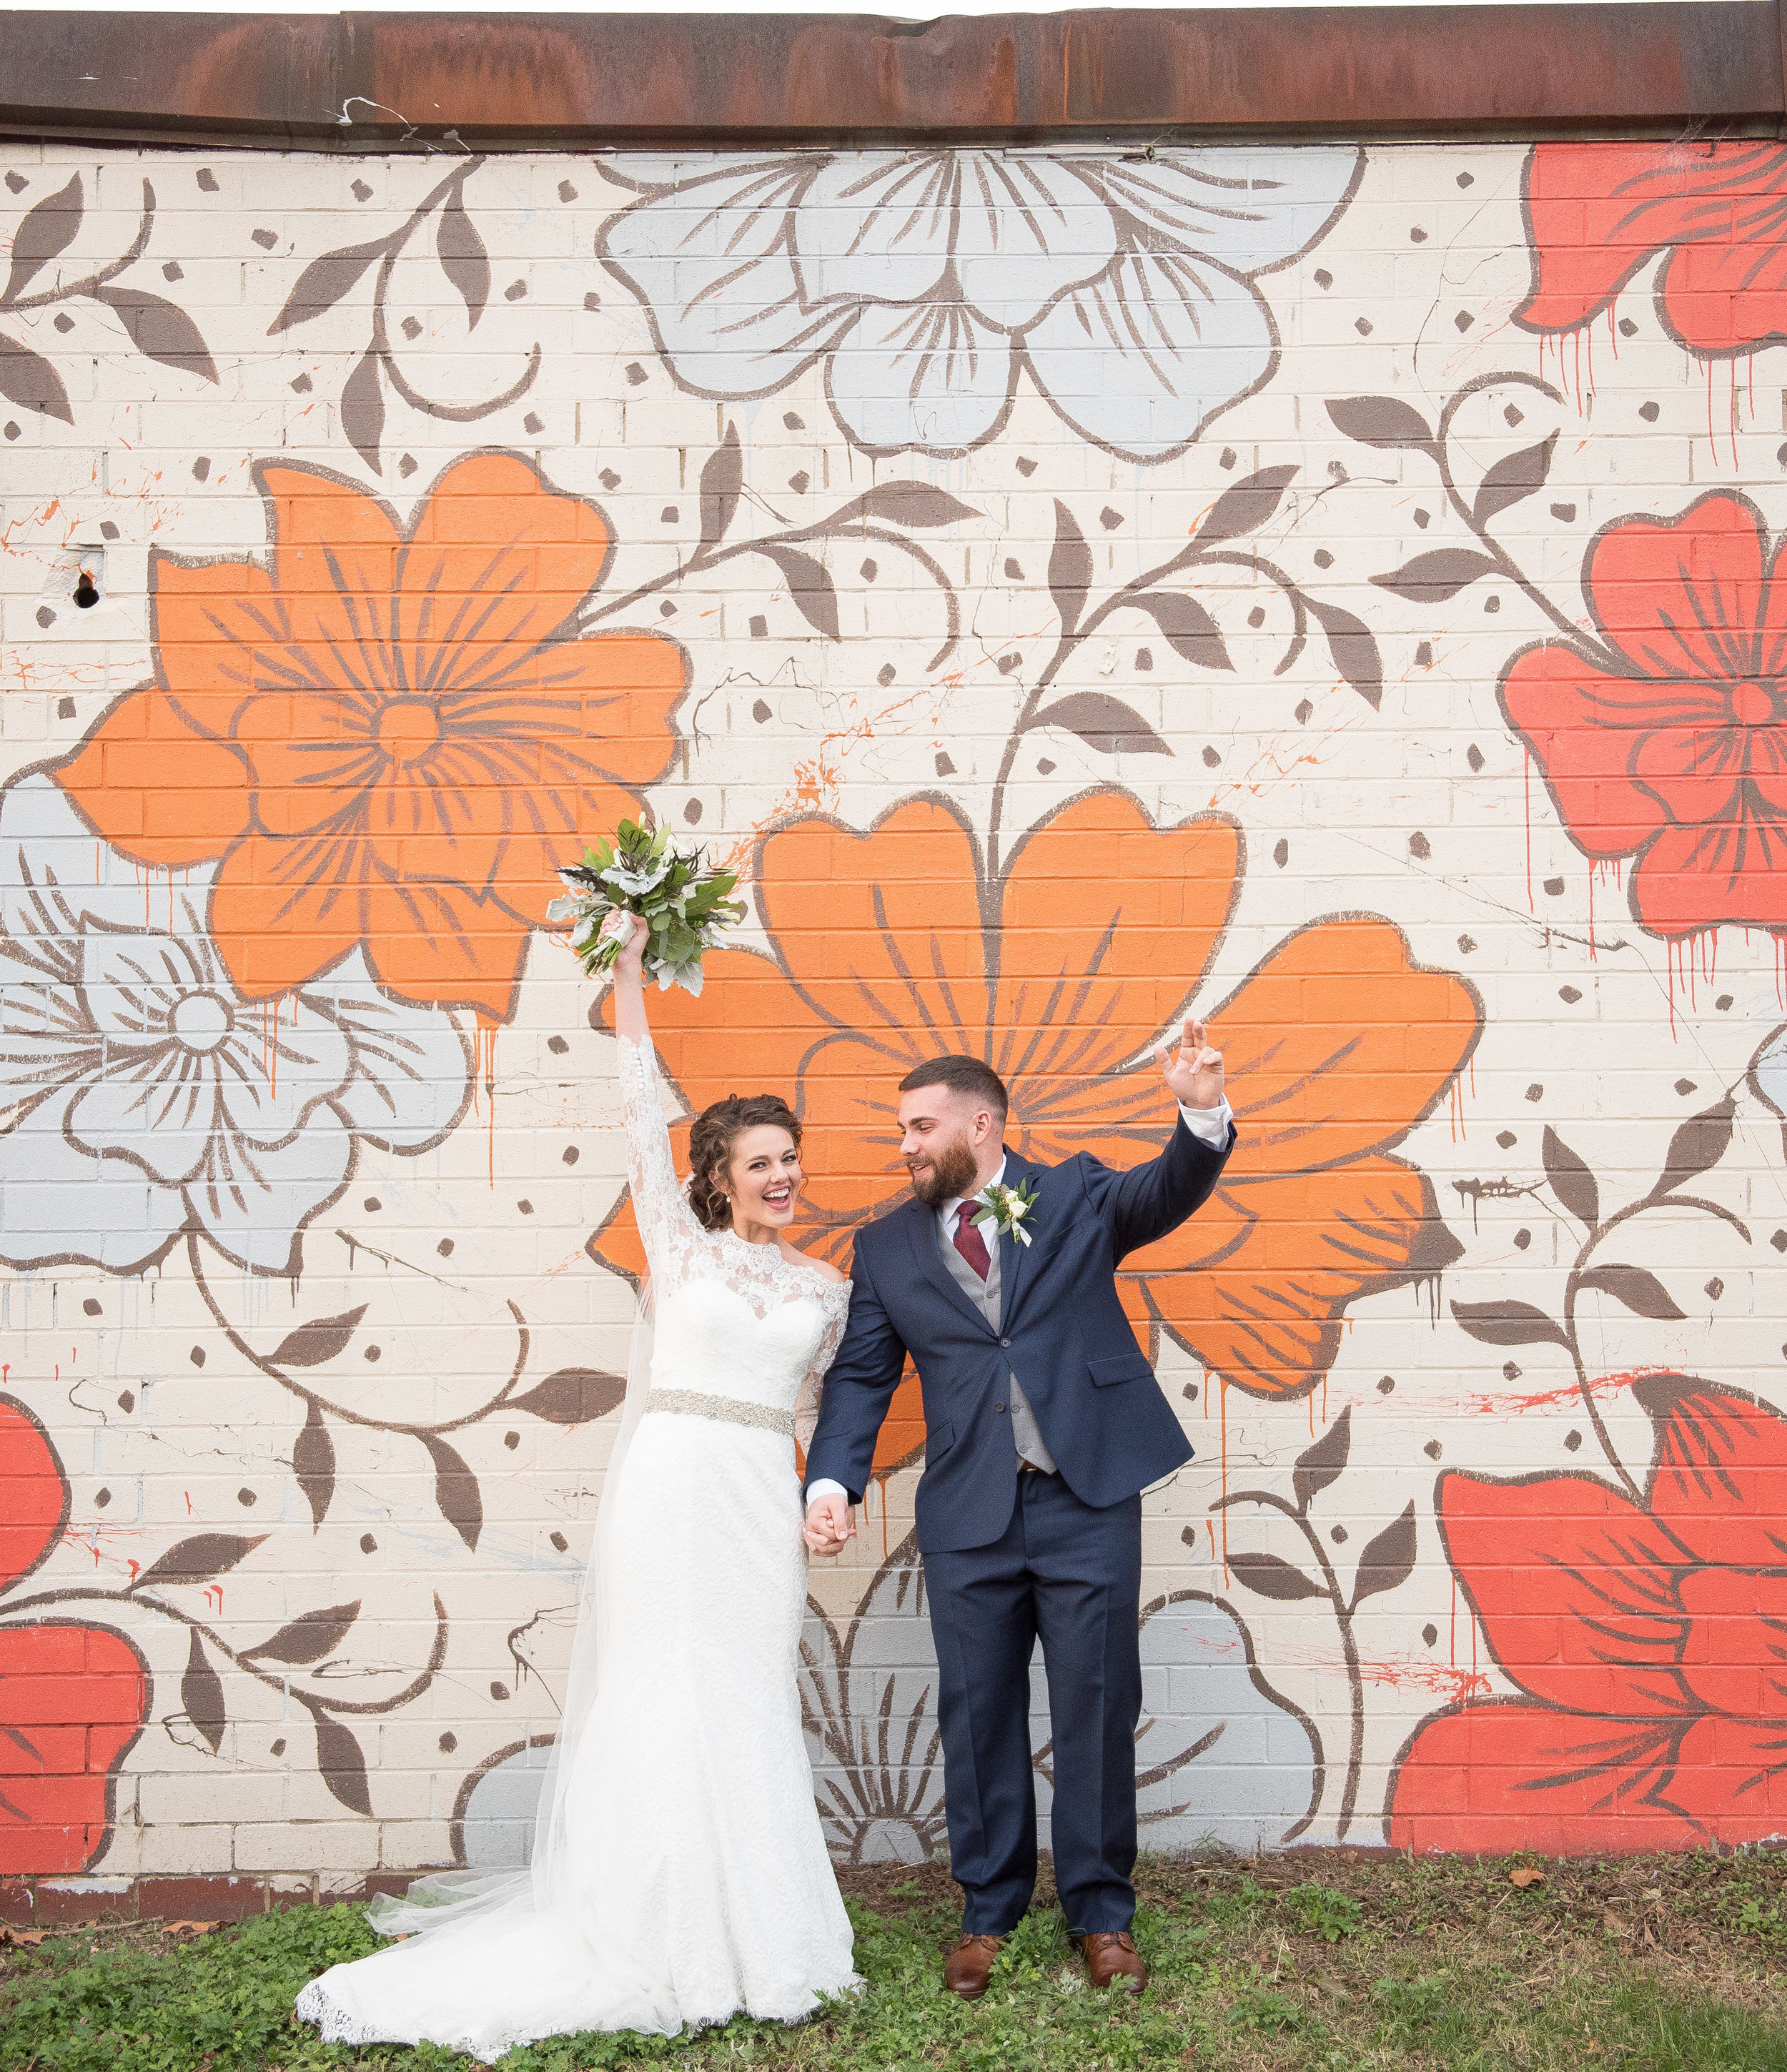 The Roller Mill Events - Winston Salem Weddings - NC Weddings - High Point NC Weddings - Winston Salem Venue - Yasmin Leonard Photography-45.jpg